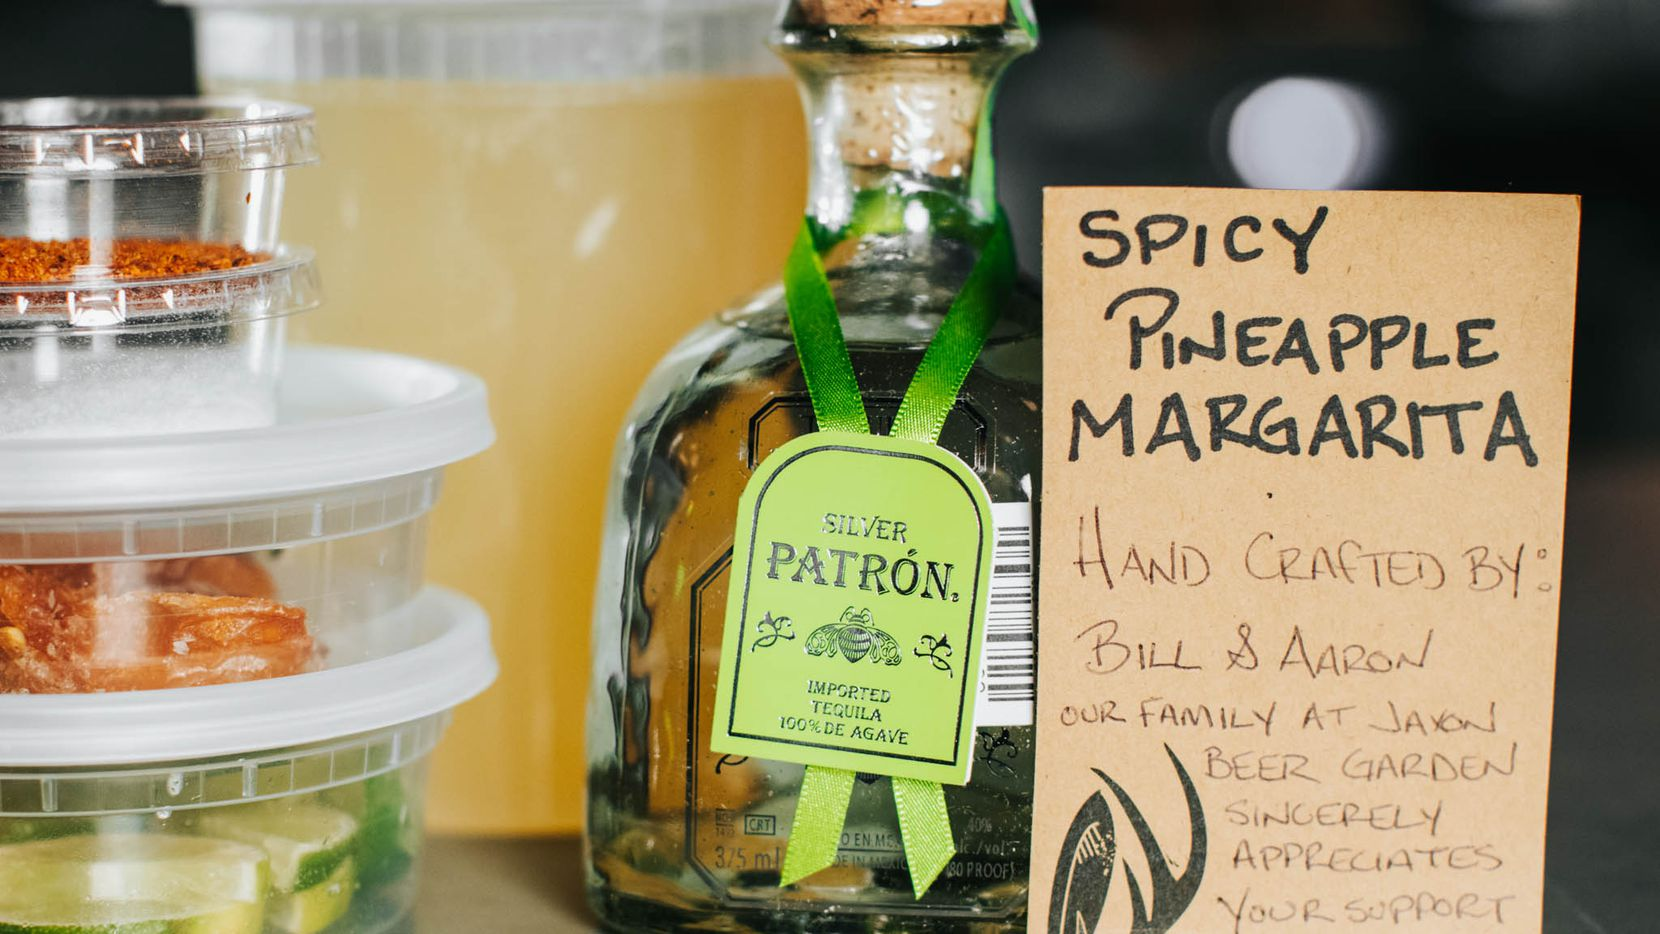 Spicy Pineapple Margarita cocktail kit from Jaxon Texas Kitchen and Beer Garden